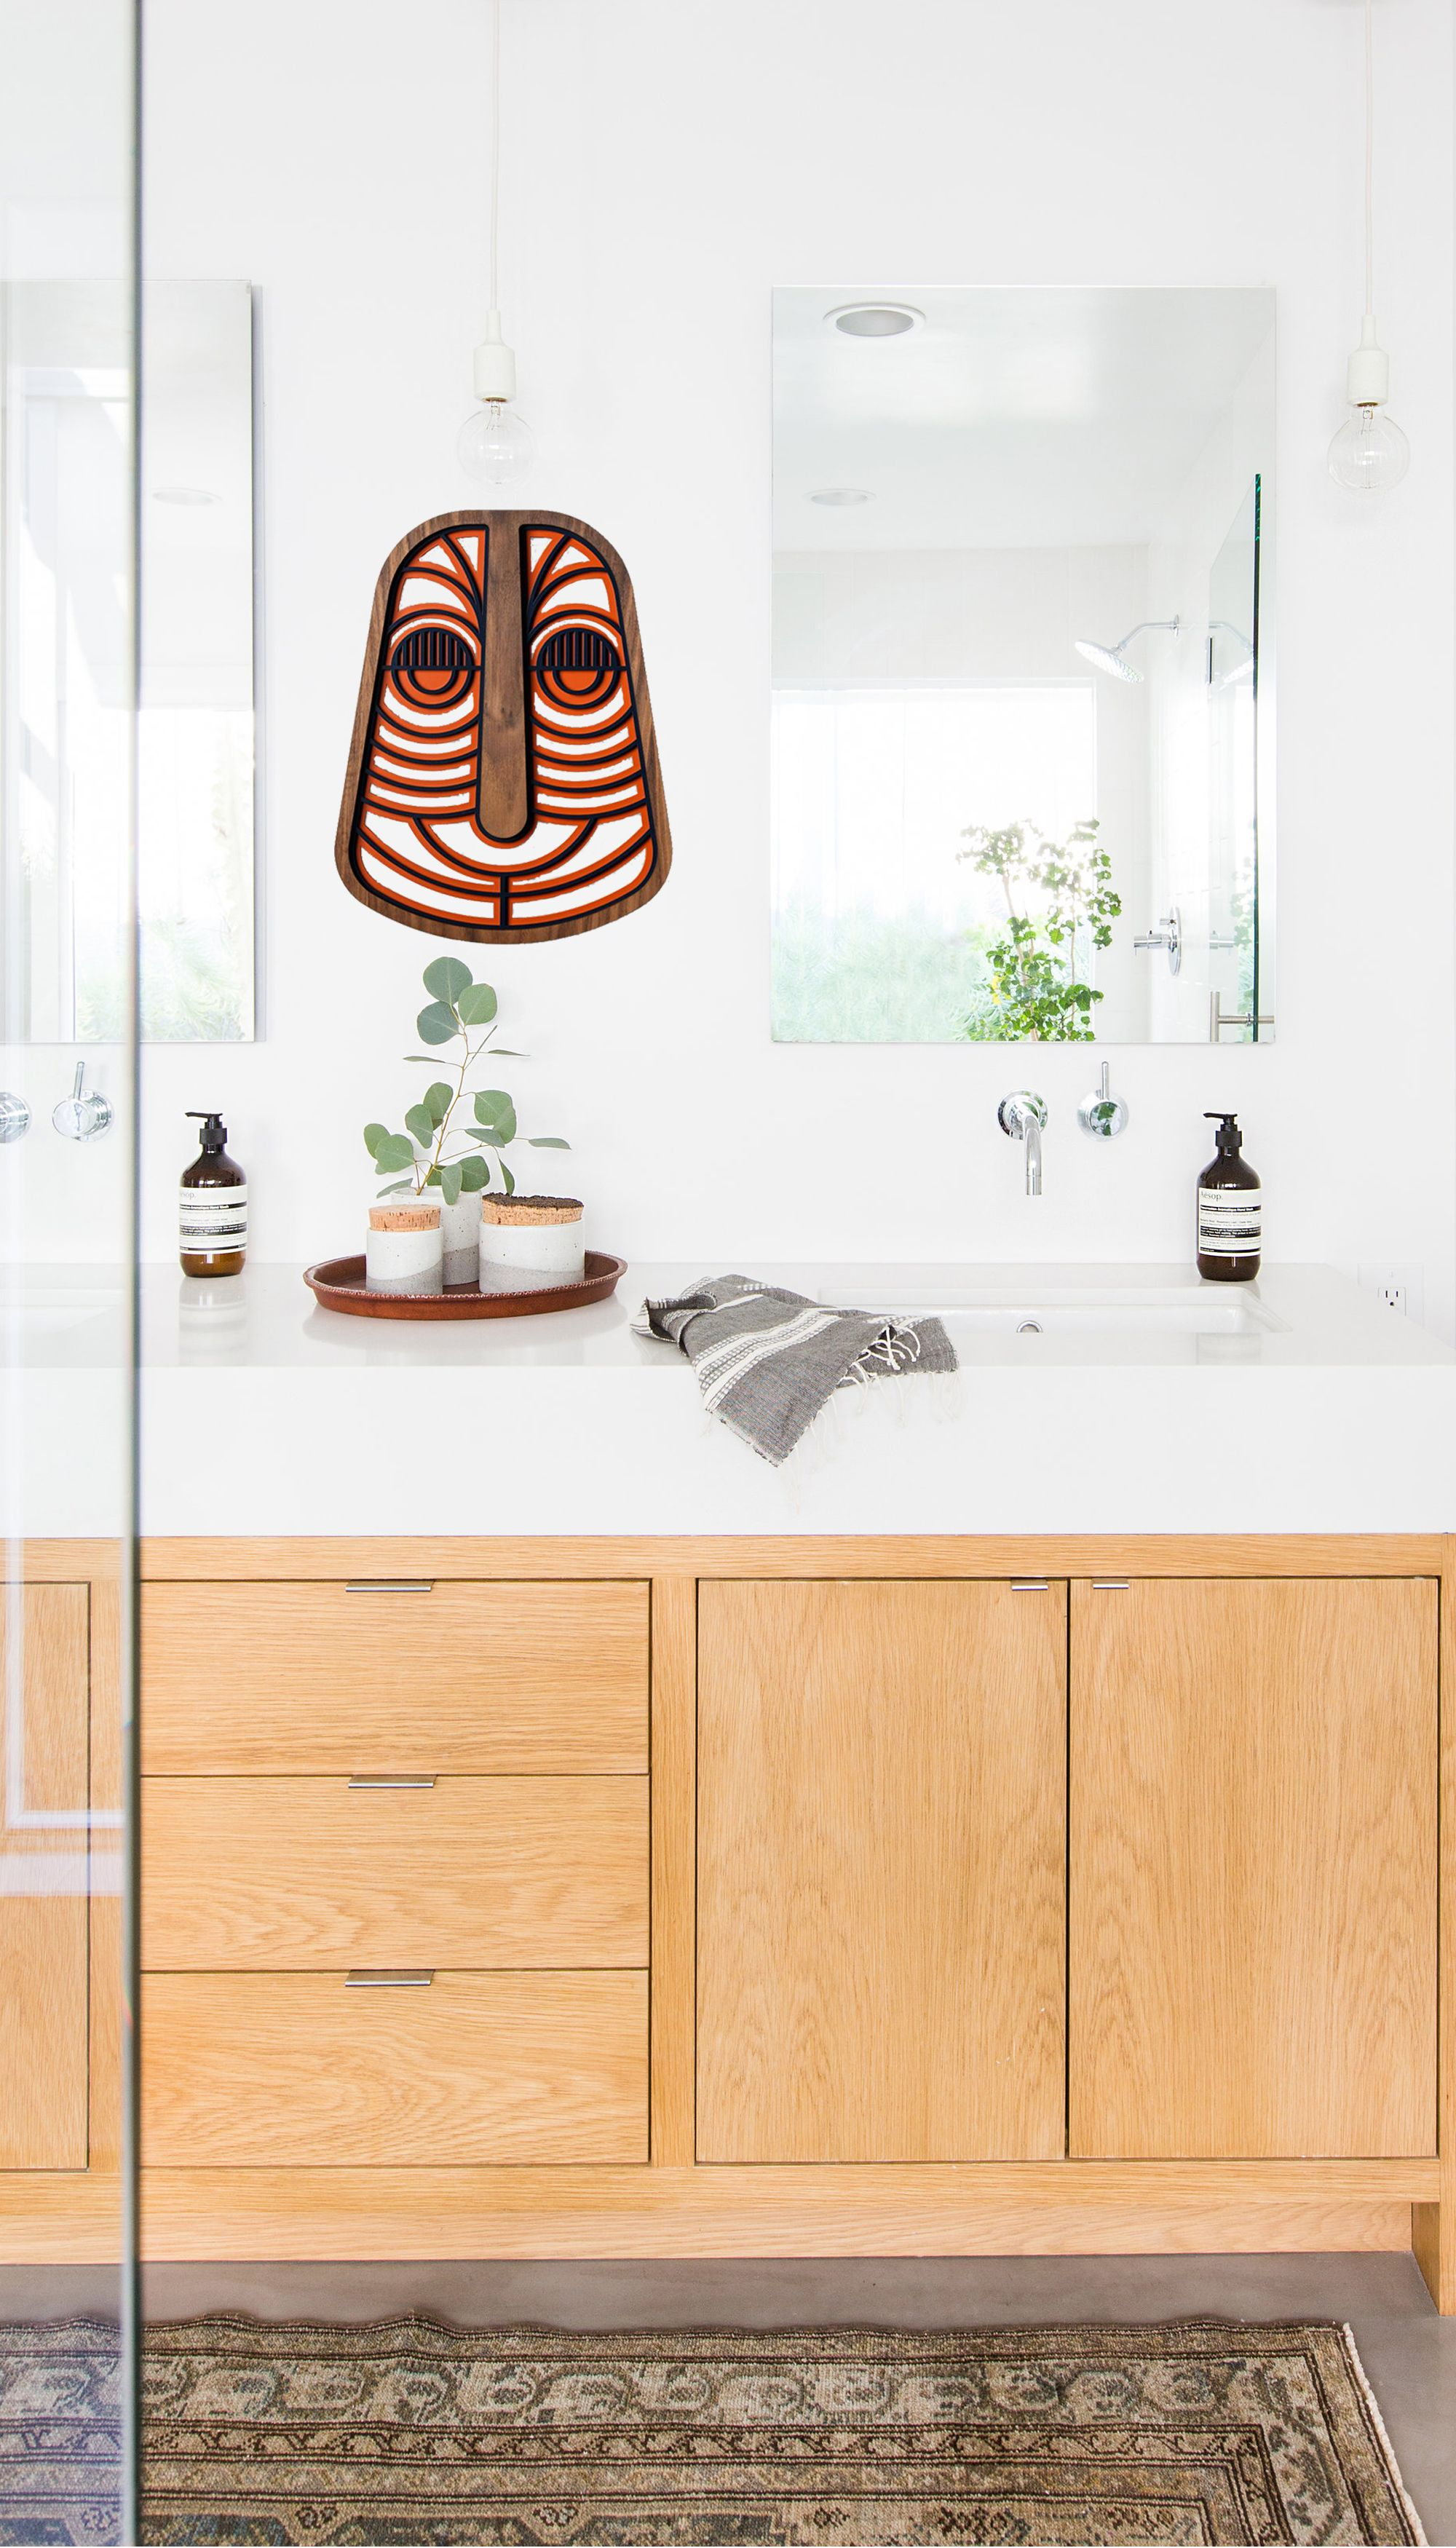 Bathroom Decorative Wall Mask With Wooden And Abstract Design Bathroom Homedecor Wallart Walldecor Etsy With Images Abstract Wall Decor Wall Mask Wooden Walls